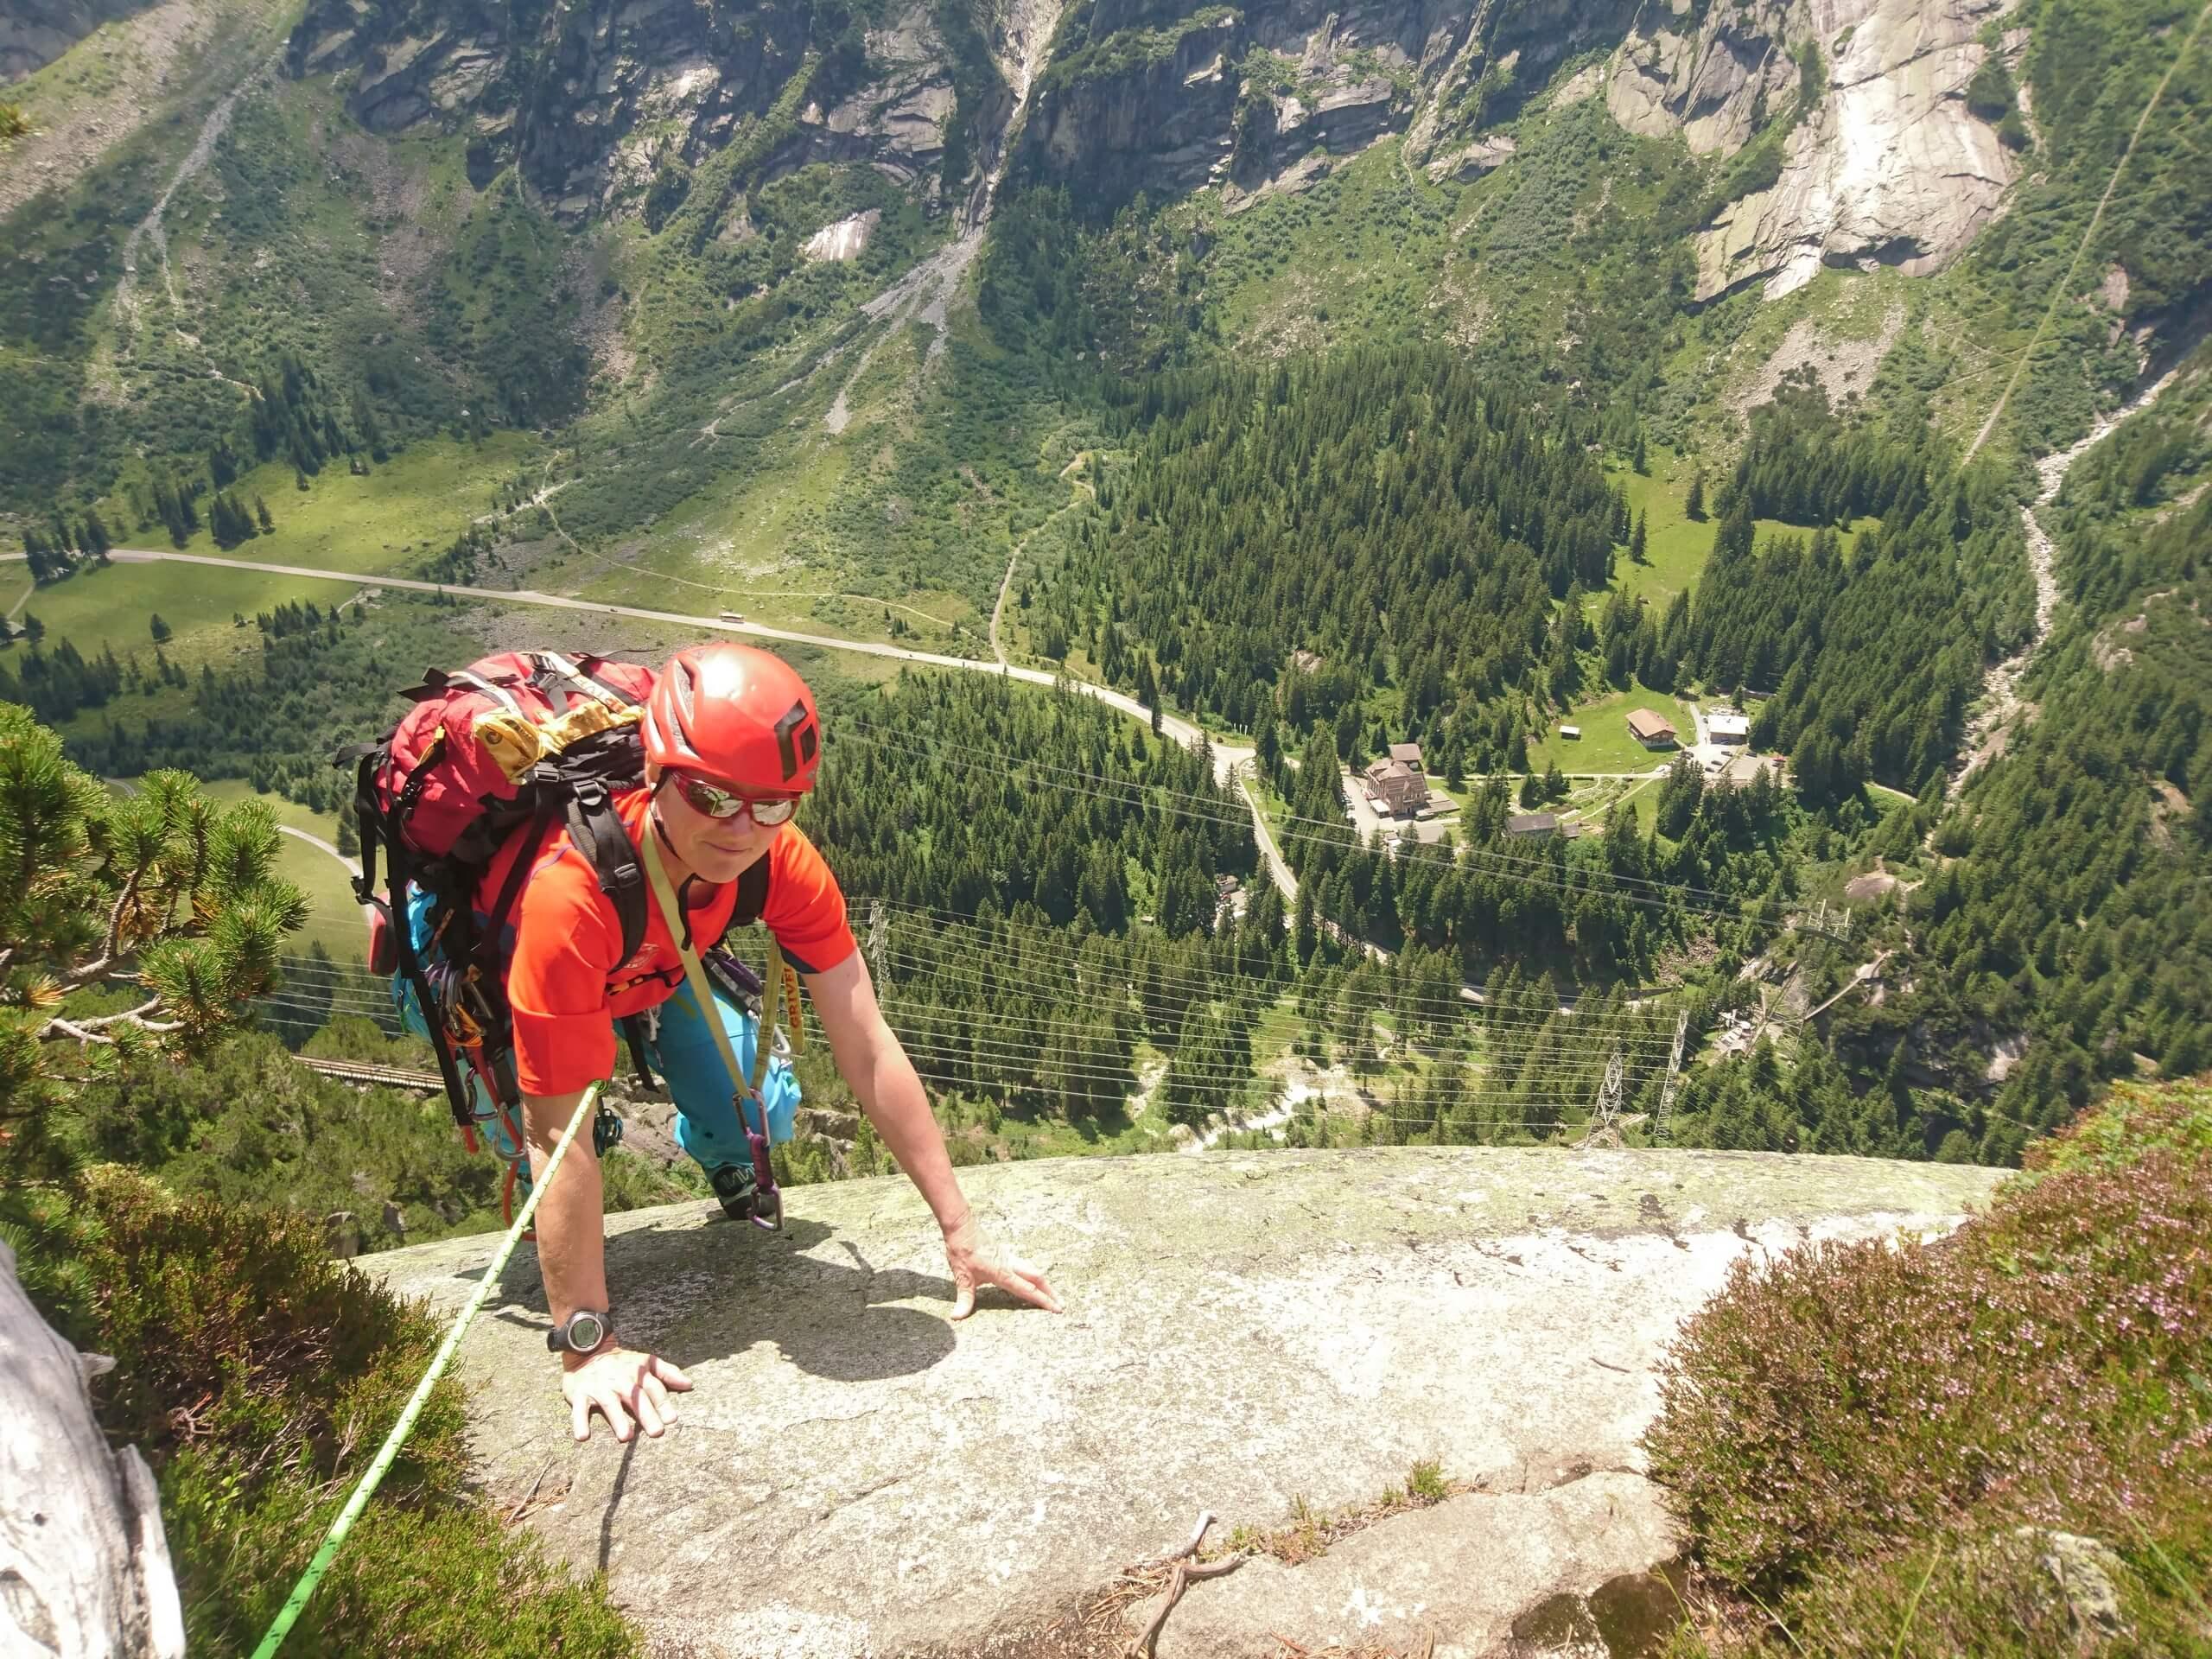 alpinschule-bergfalke-thun-interlaken-sommer-klettern